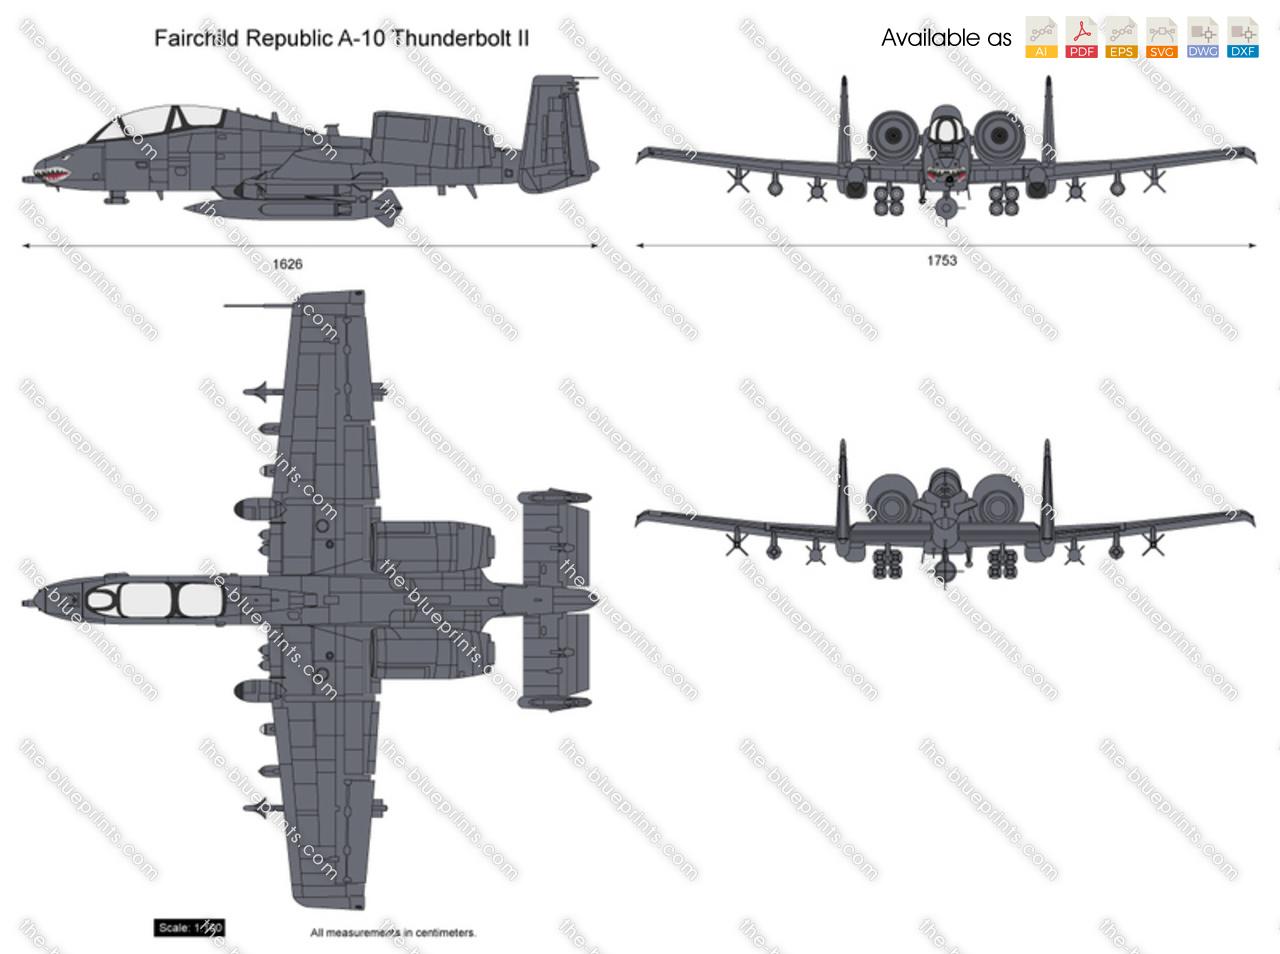 A 10 Thunderbolt Drawing Fairchild Republic A-10